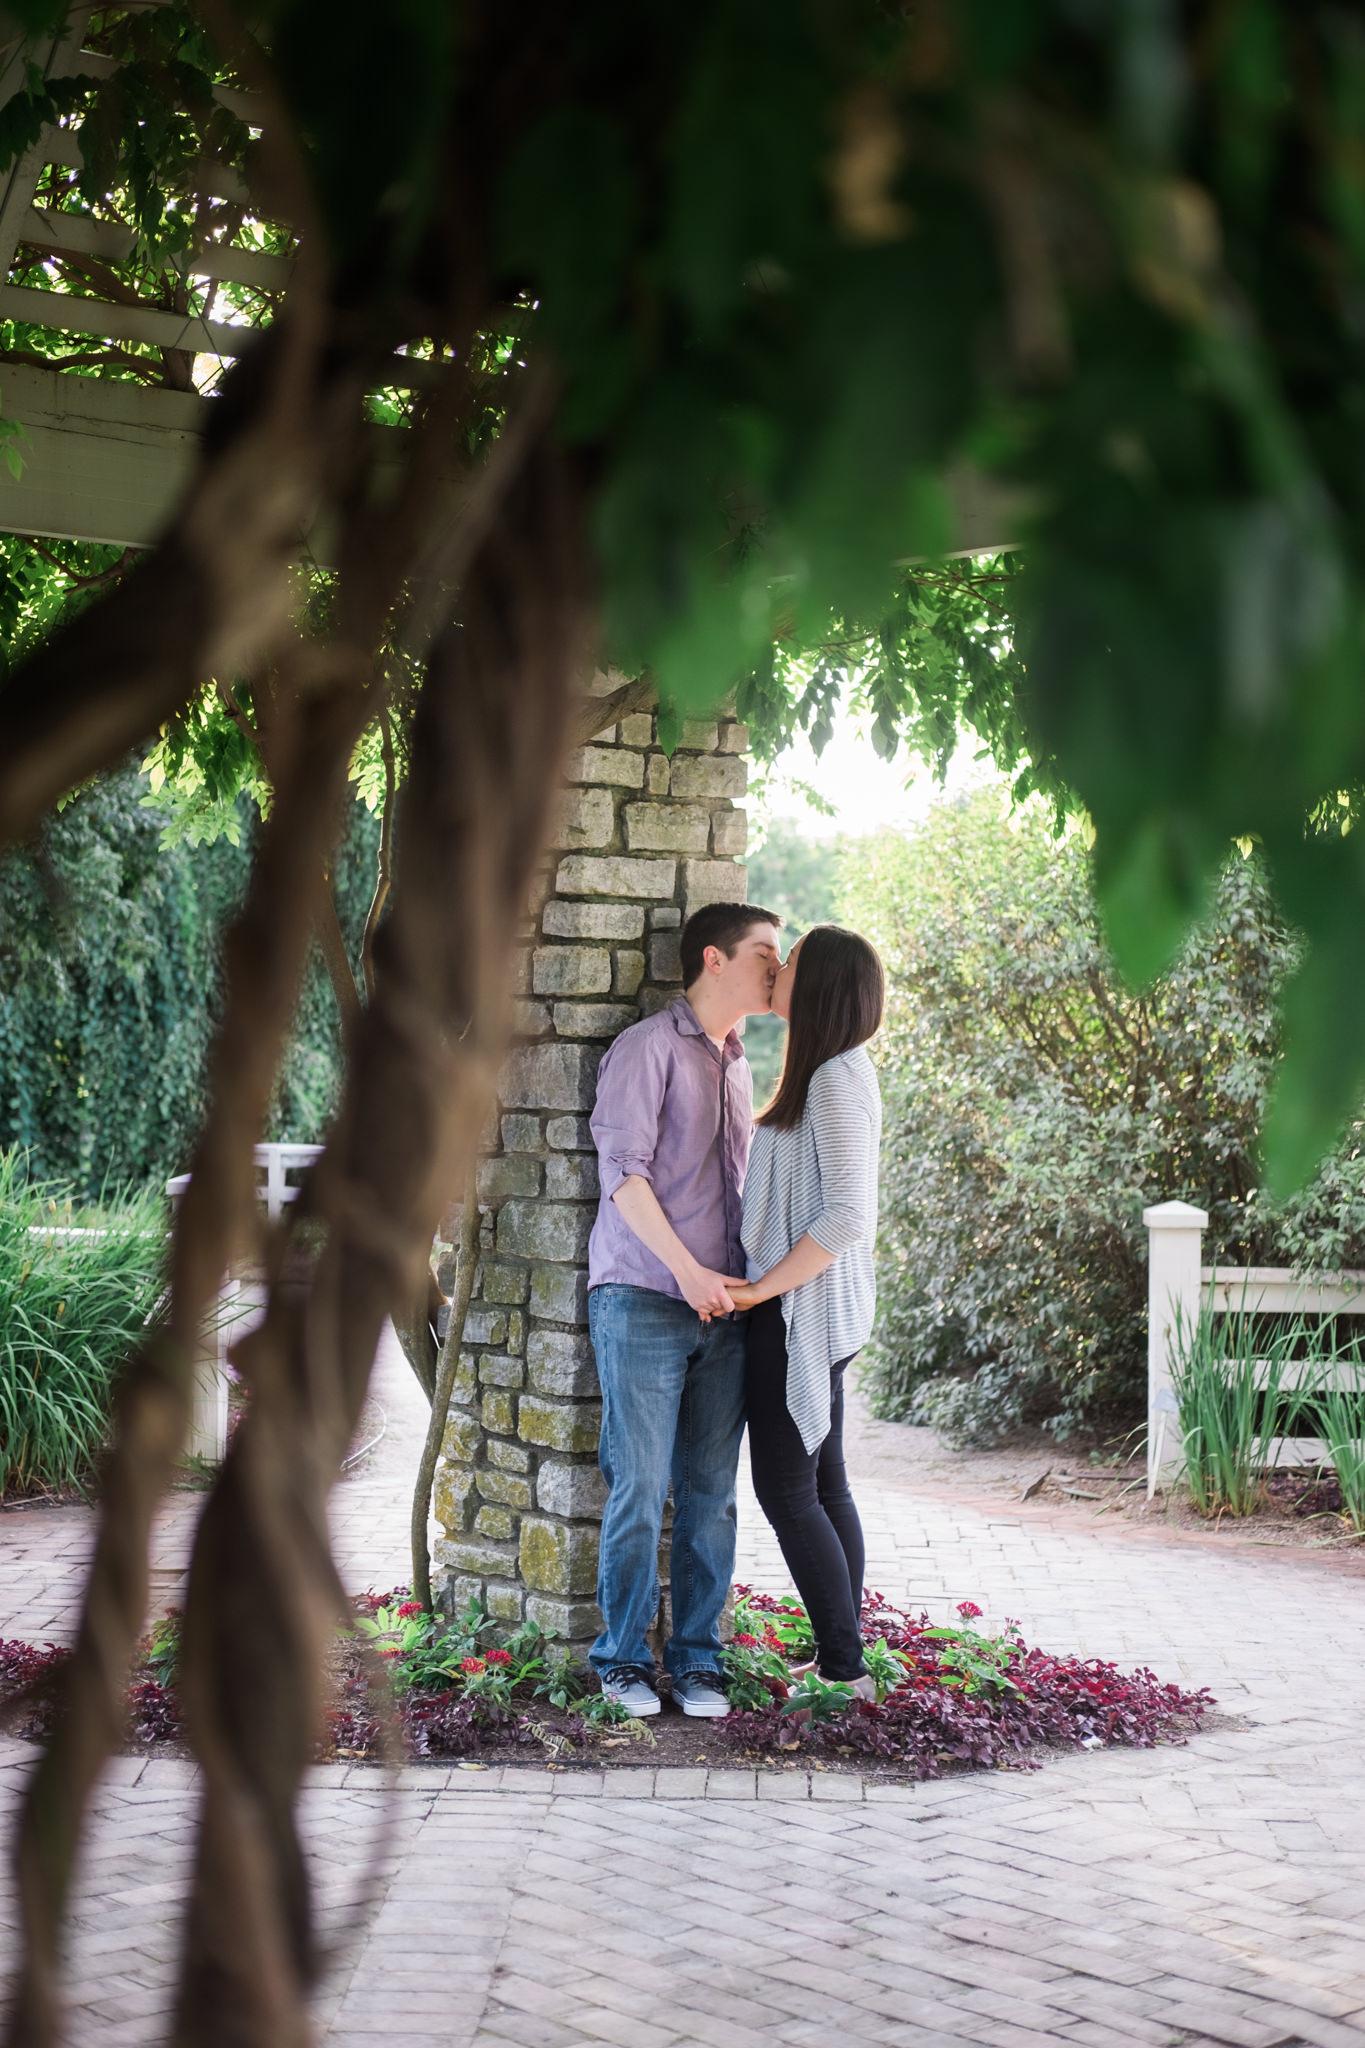 Rachel&Josh_Engagement_Blog_0002.jpg